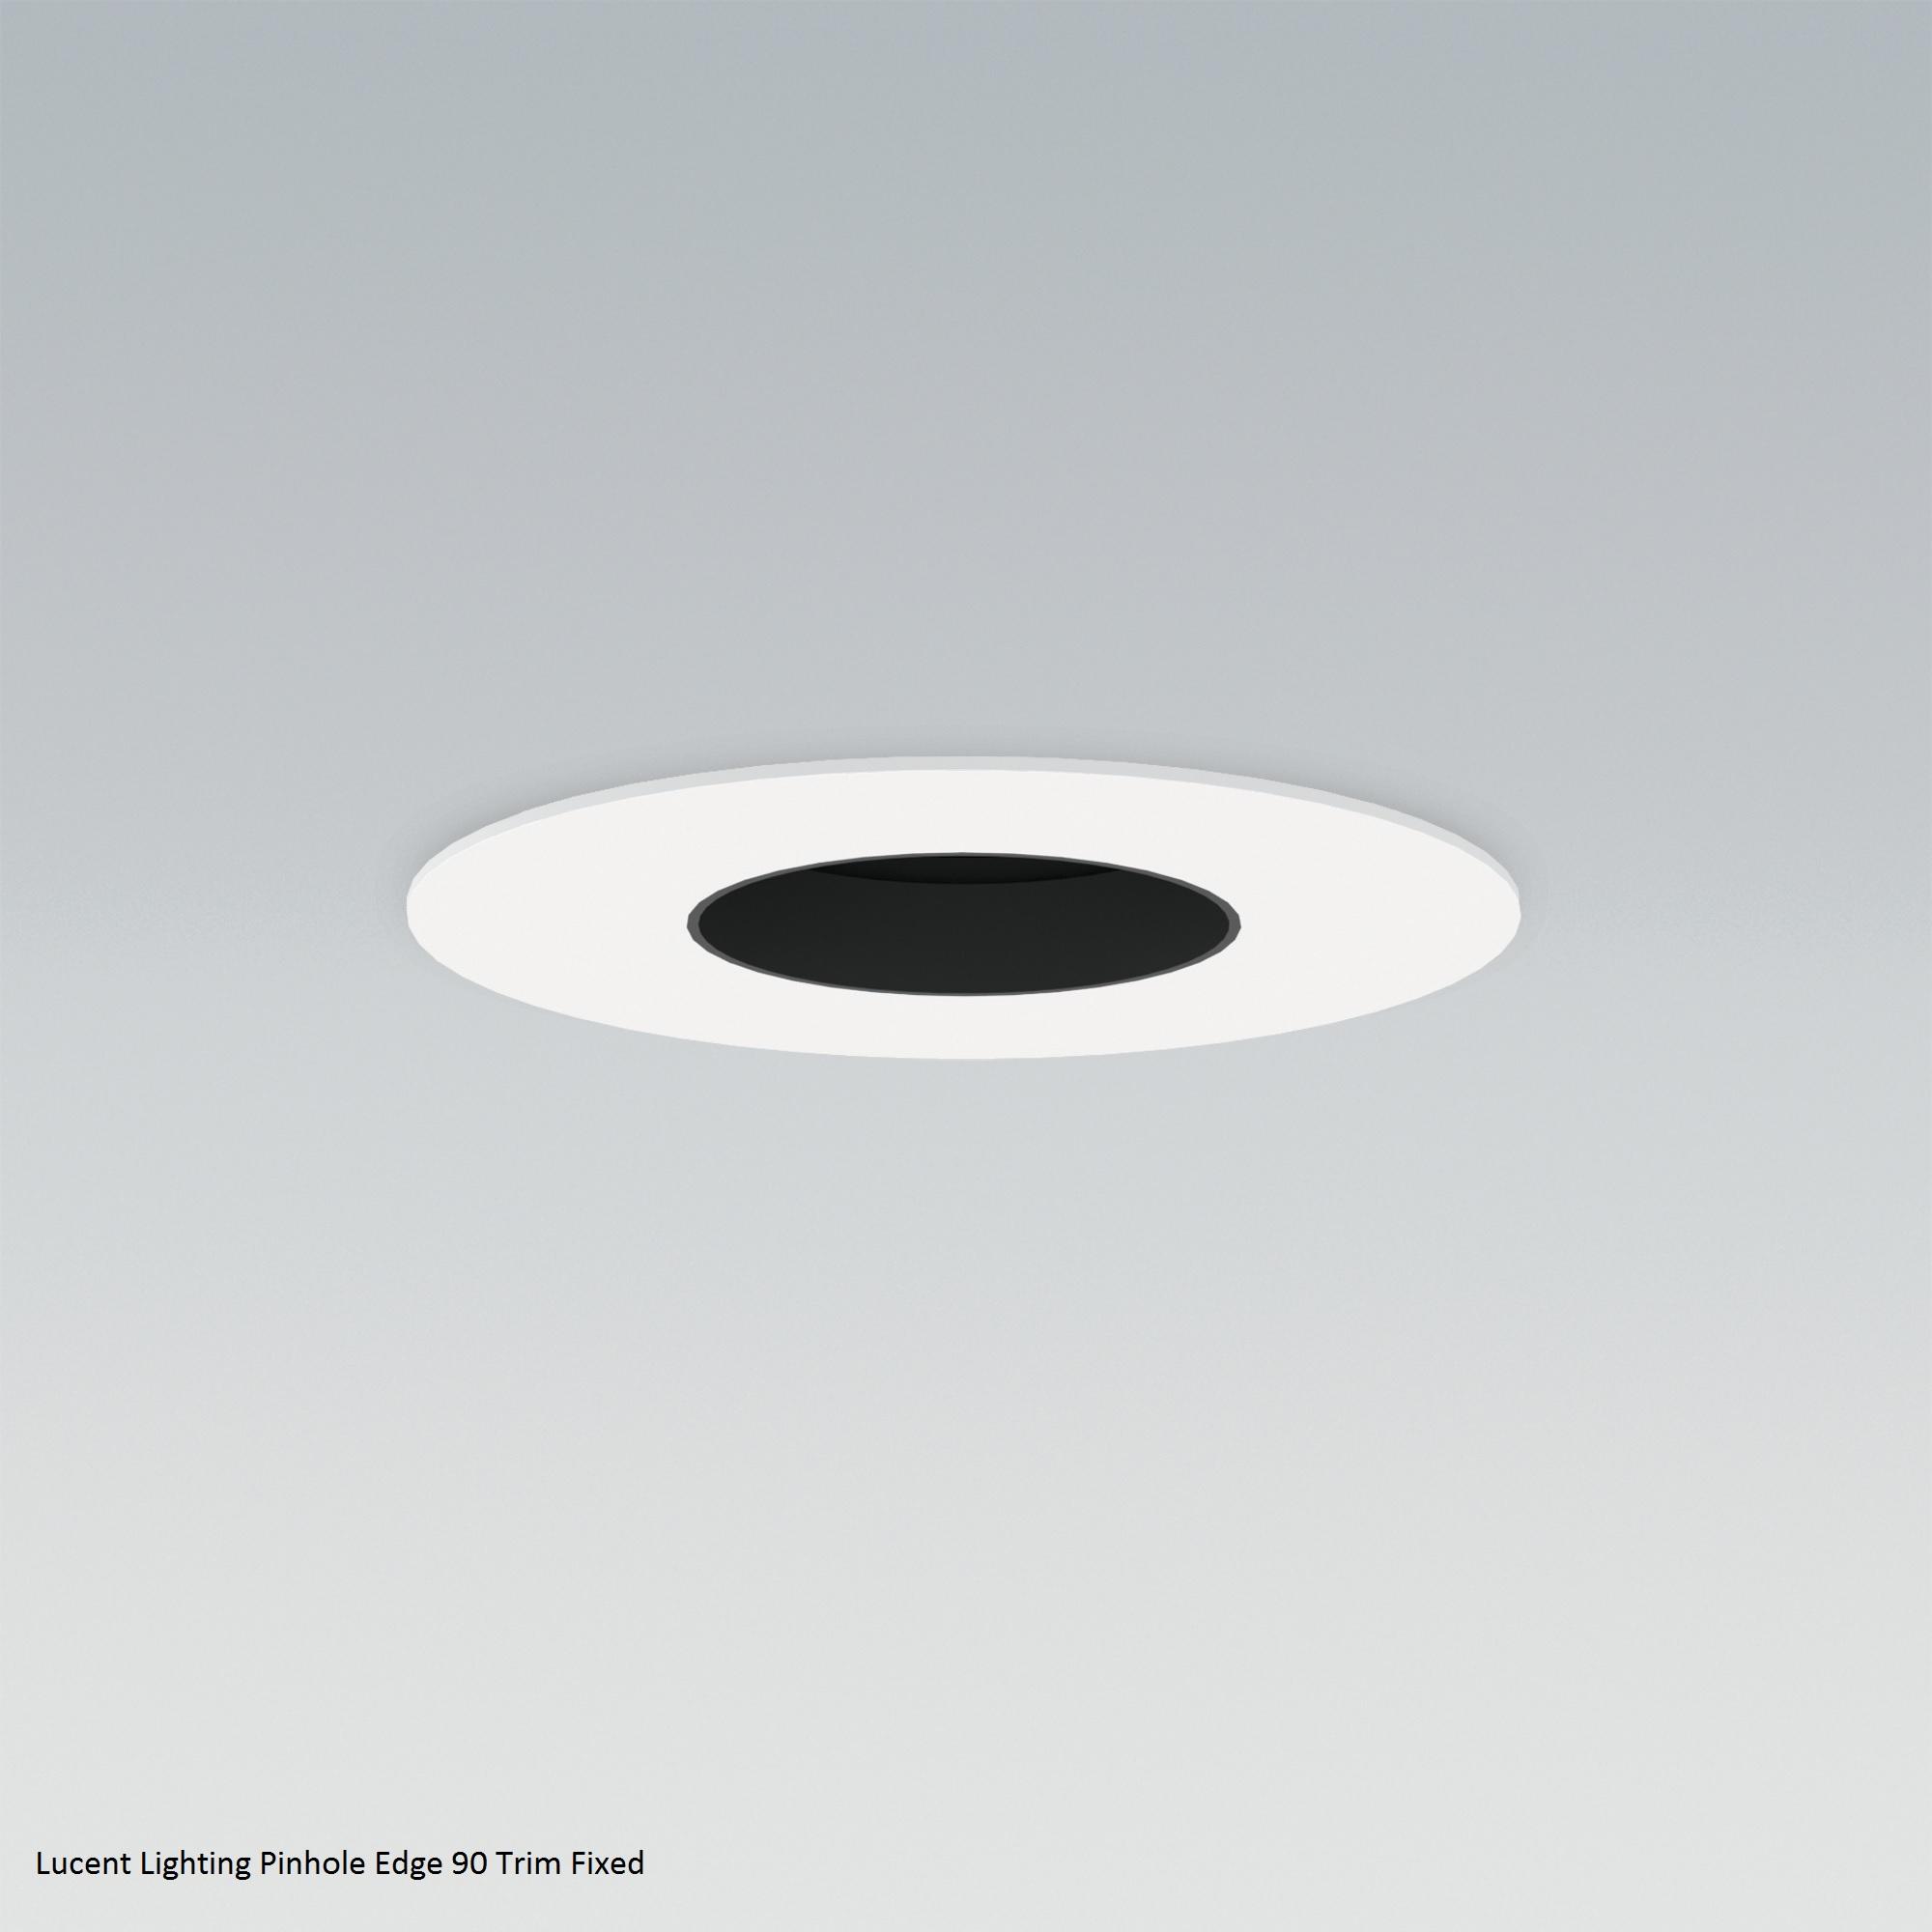 lucentlightingpinholeedge90trimfixed